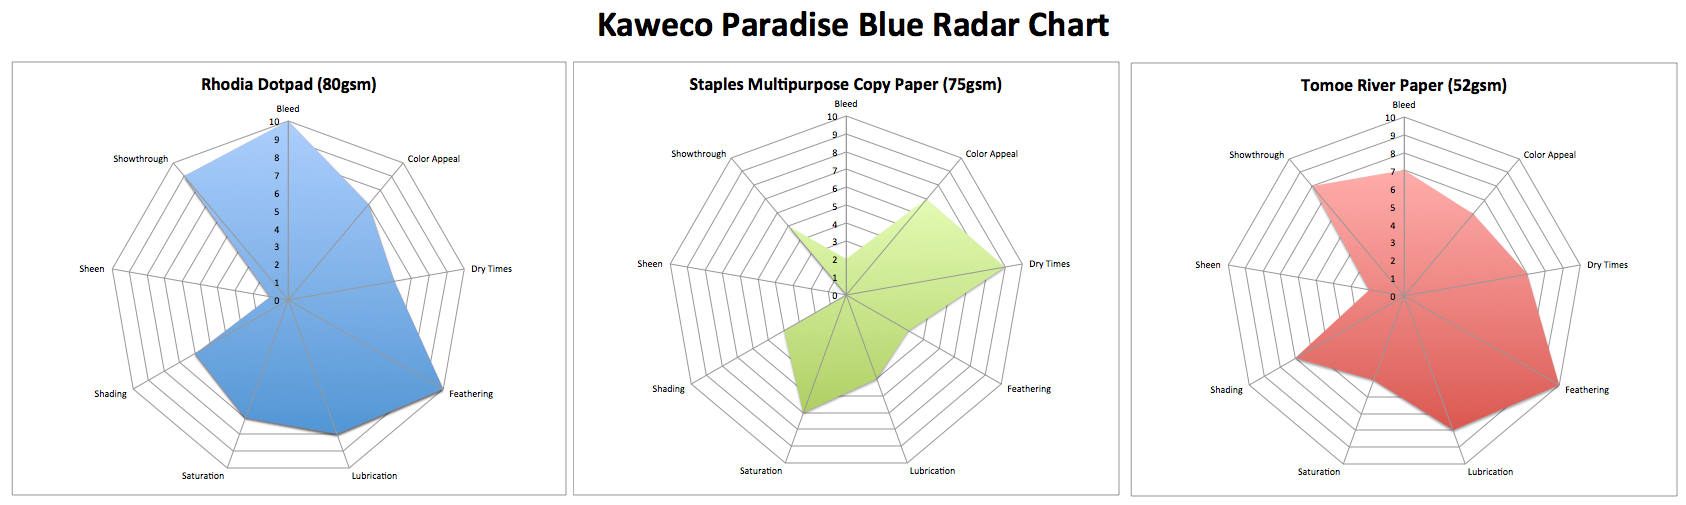 Kaweco Paradise Blue